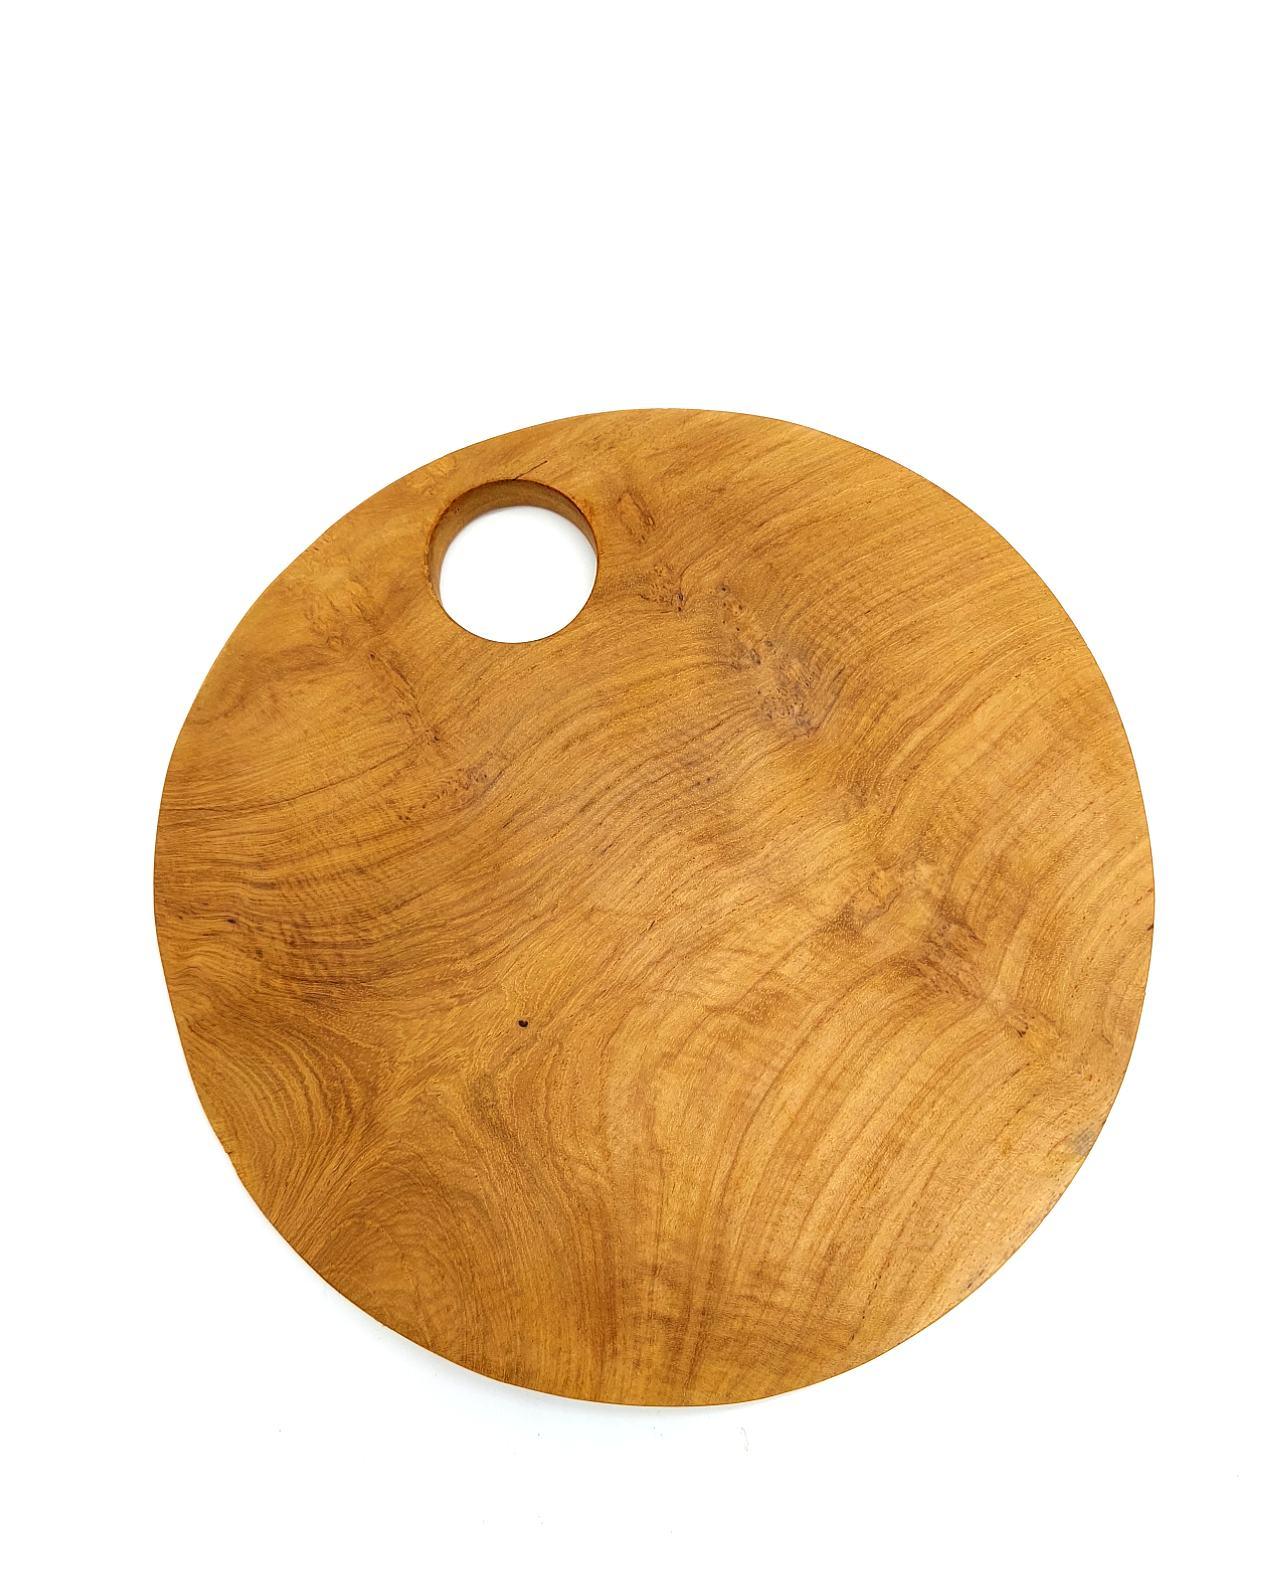 Teak Wood Cutting Board Round Diameter 21 cm